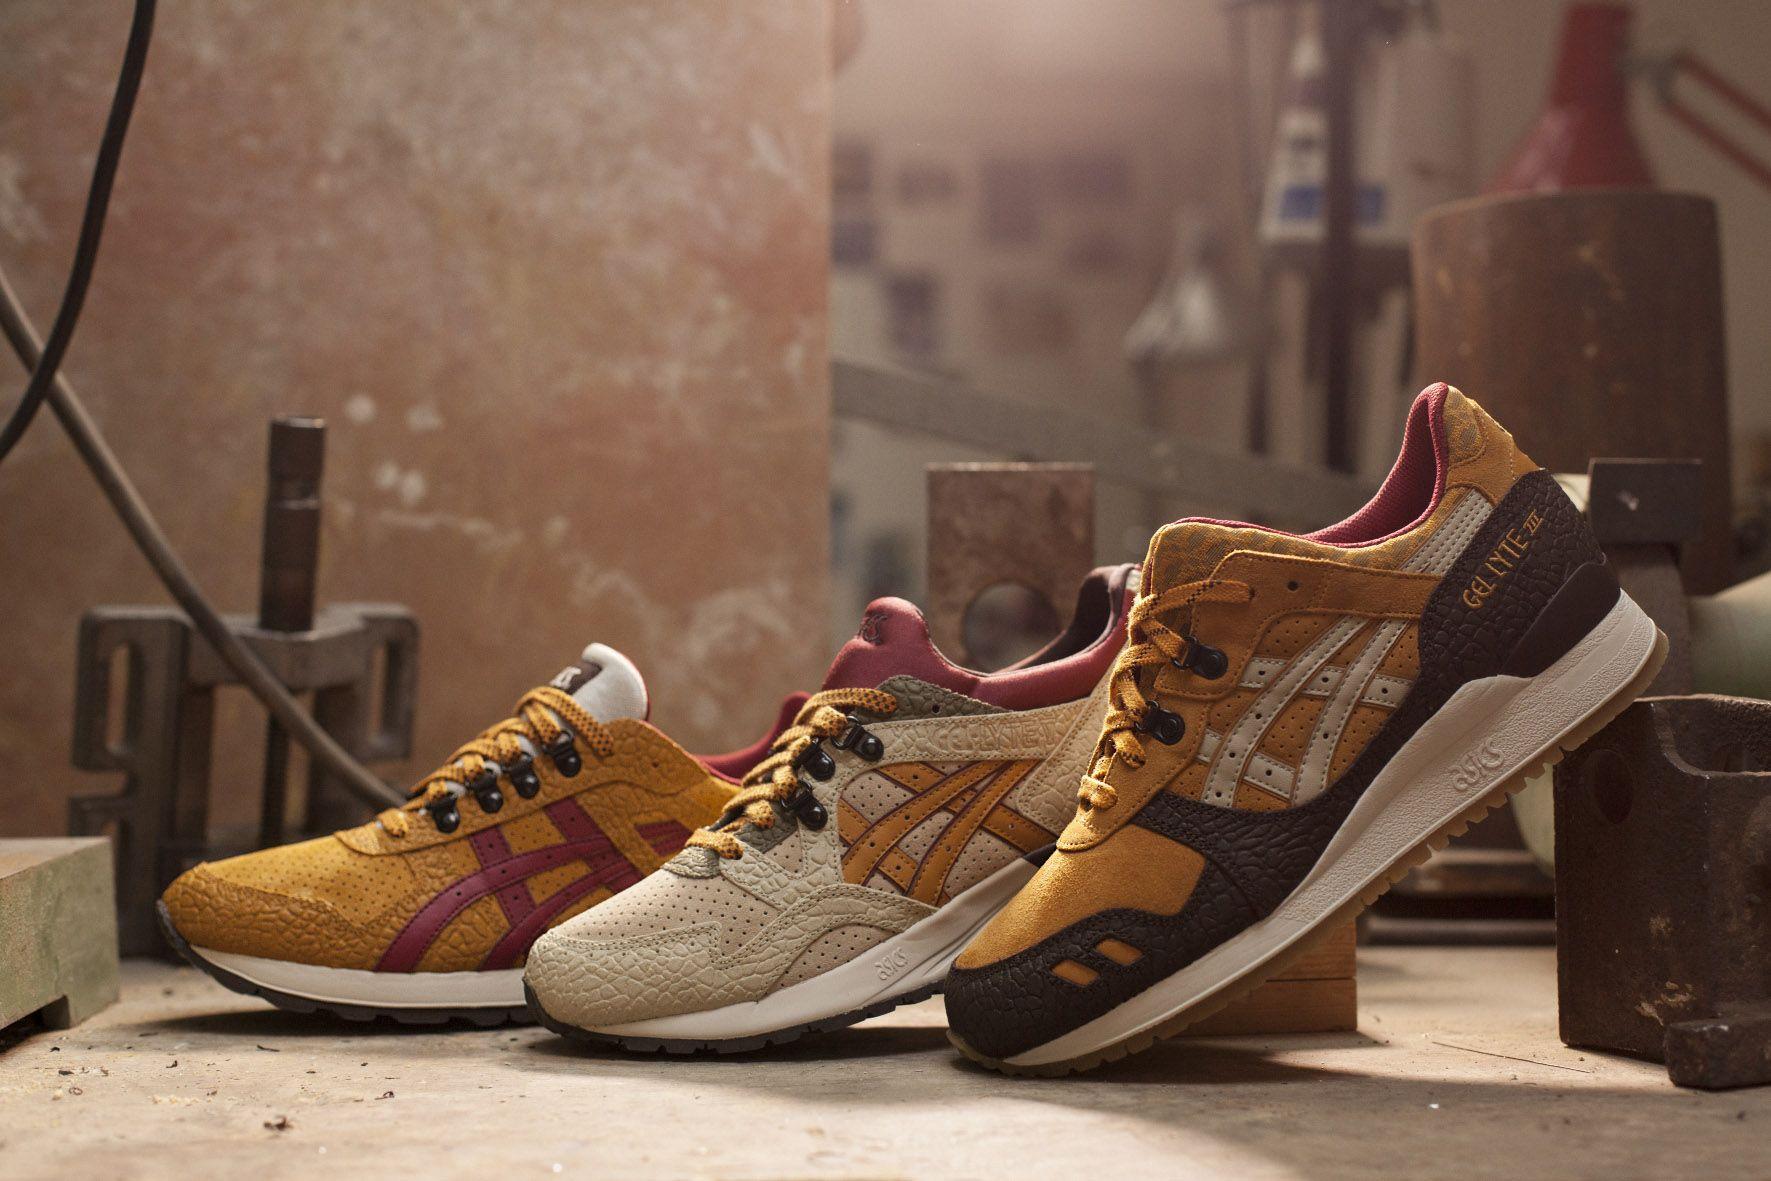 Asics Tiger – Workwear Pack,  #Asics #ASICSTiger #sneaker #workwearpack, #agpos, #sneaker, #sneakers, #sneakerhead, #solecollector, #sneakerfreaker,  #nicekicks, #kicks, #kotd, #kicks4eva #kicks0l0gy, #kicksonfire, #womft, #walklikeus, #schuhe, #turnschuhe, #yeezy, #nike, #adidas, #puma, #asics, #newbalance #jordan, #airjordan, #kicks